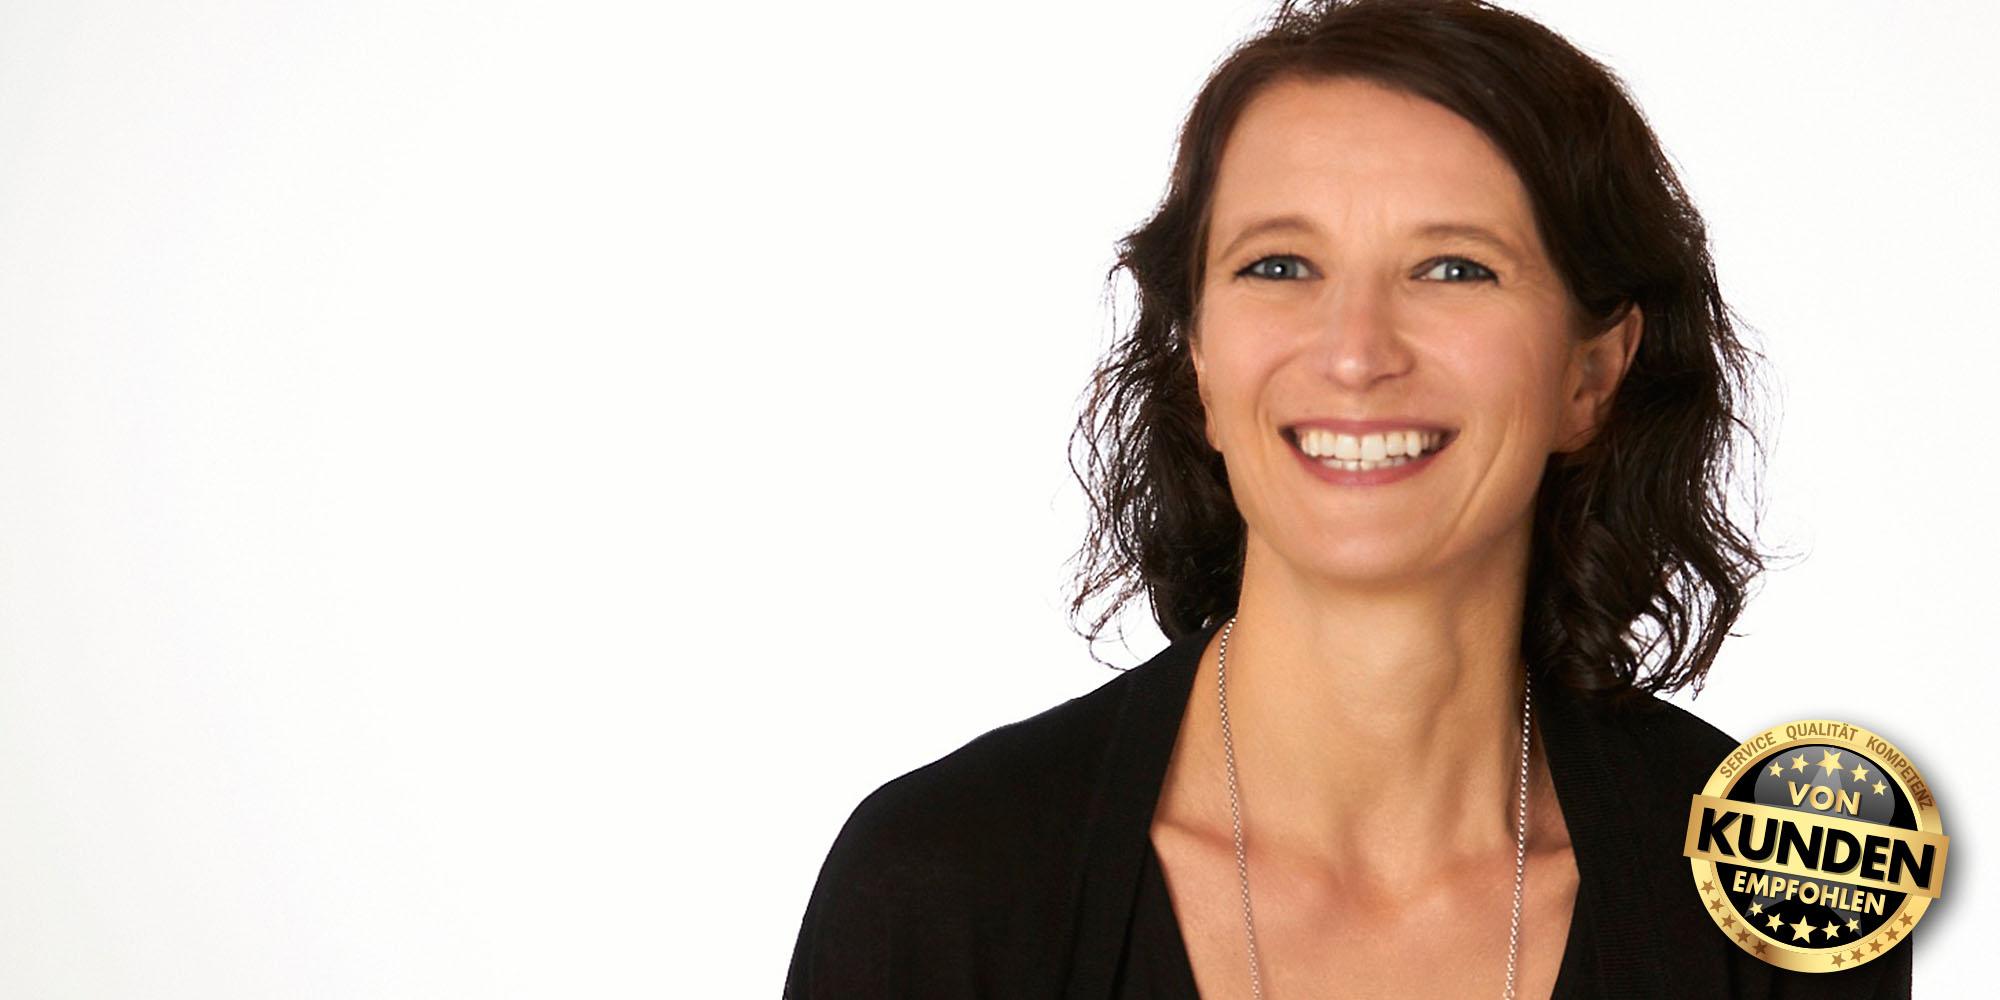 Portraitfotos_Business-Portrait_@_blickfang2.de_fotostudios_filmstudios, Andernach und Weinheim